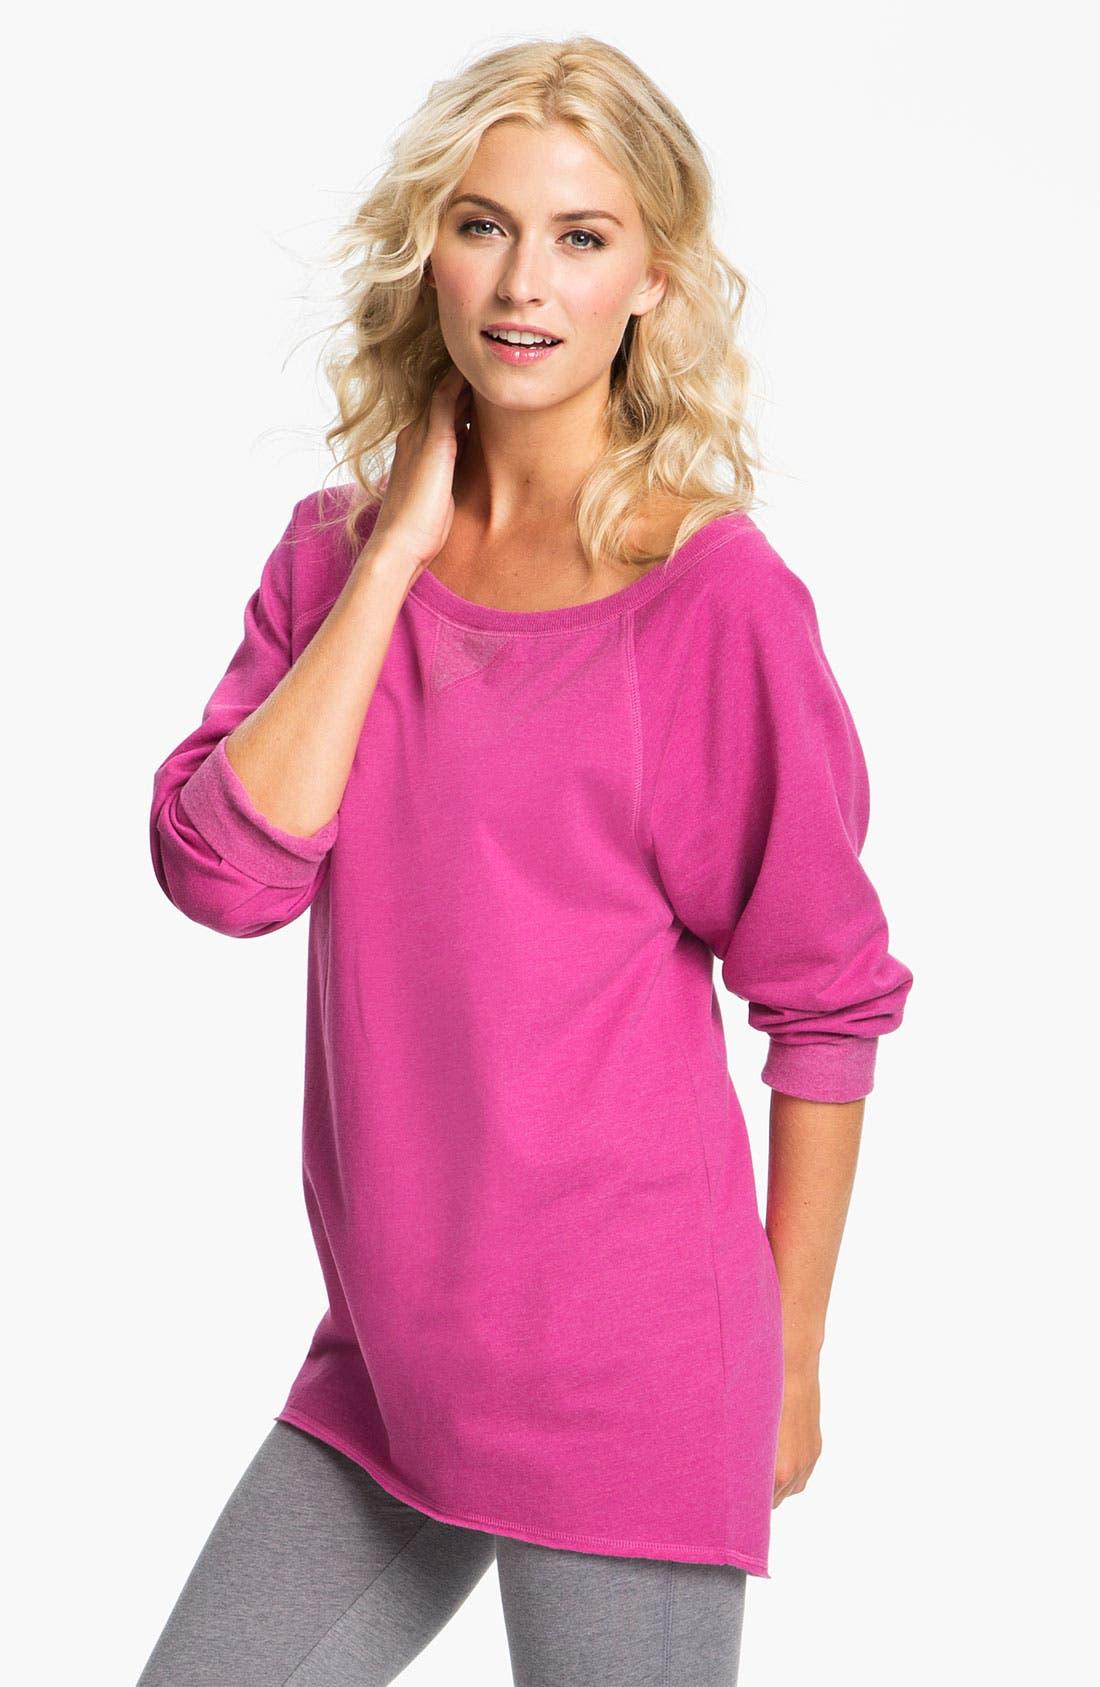 Alternate Image 1 Selected - Make + Model 'Bundled' Sweatshirt